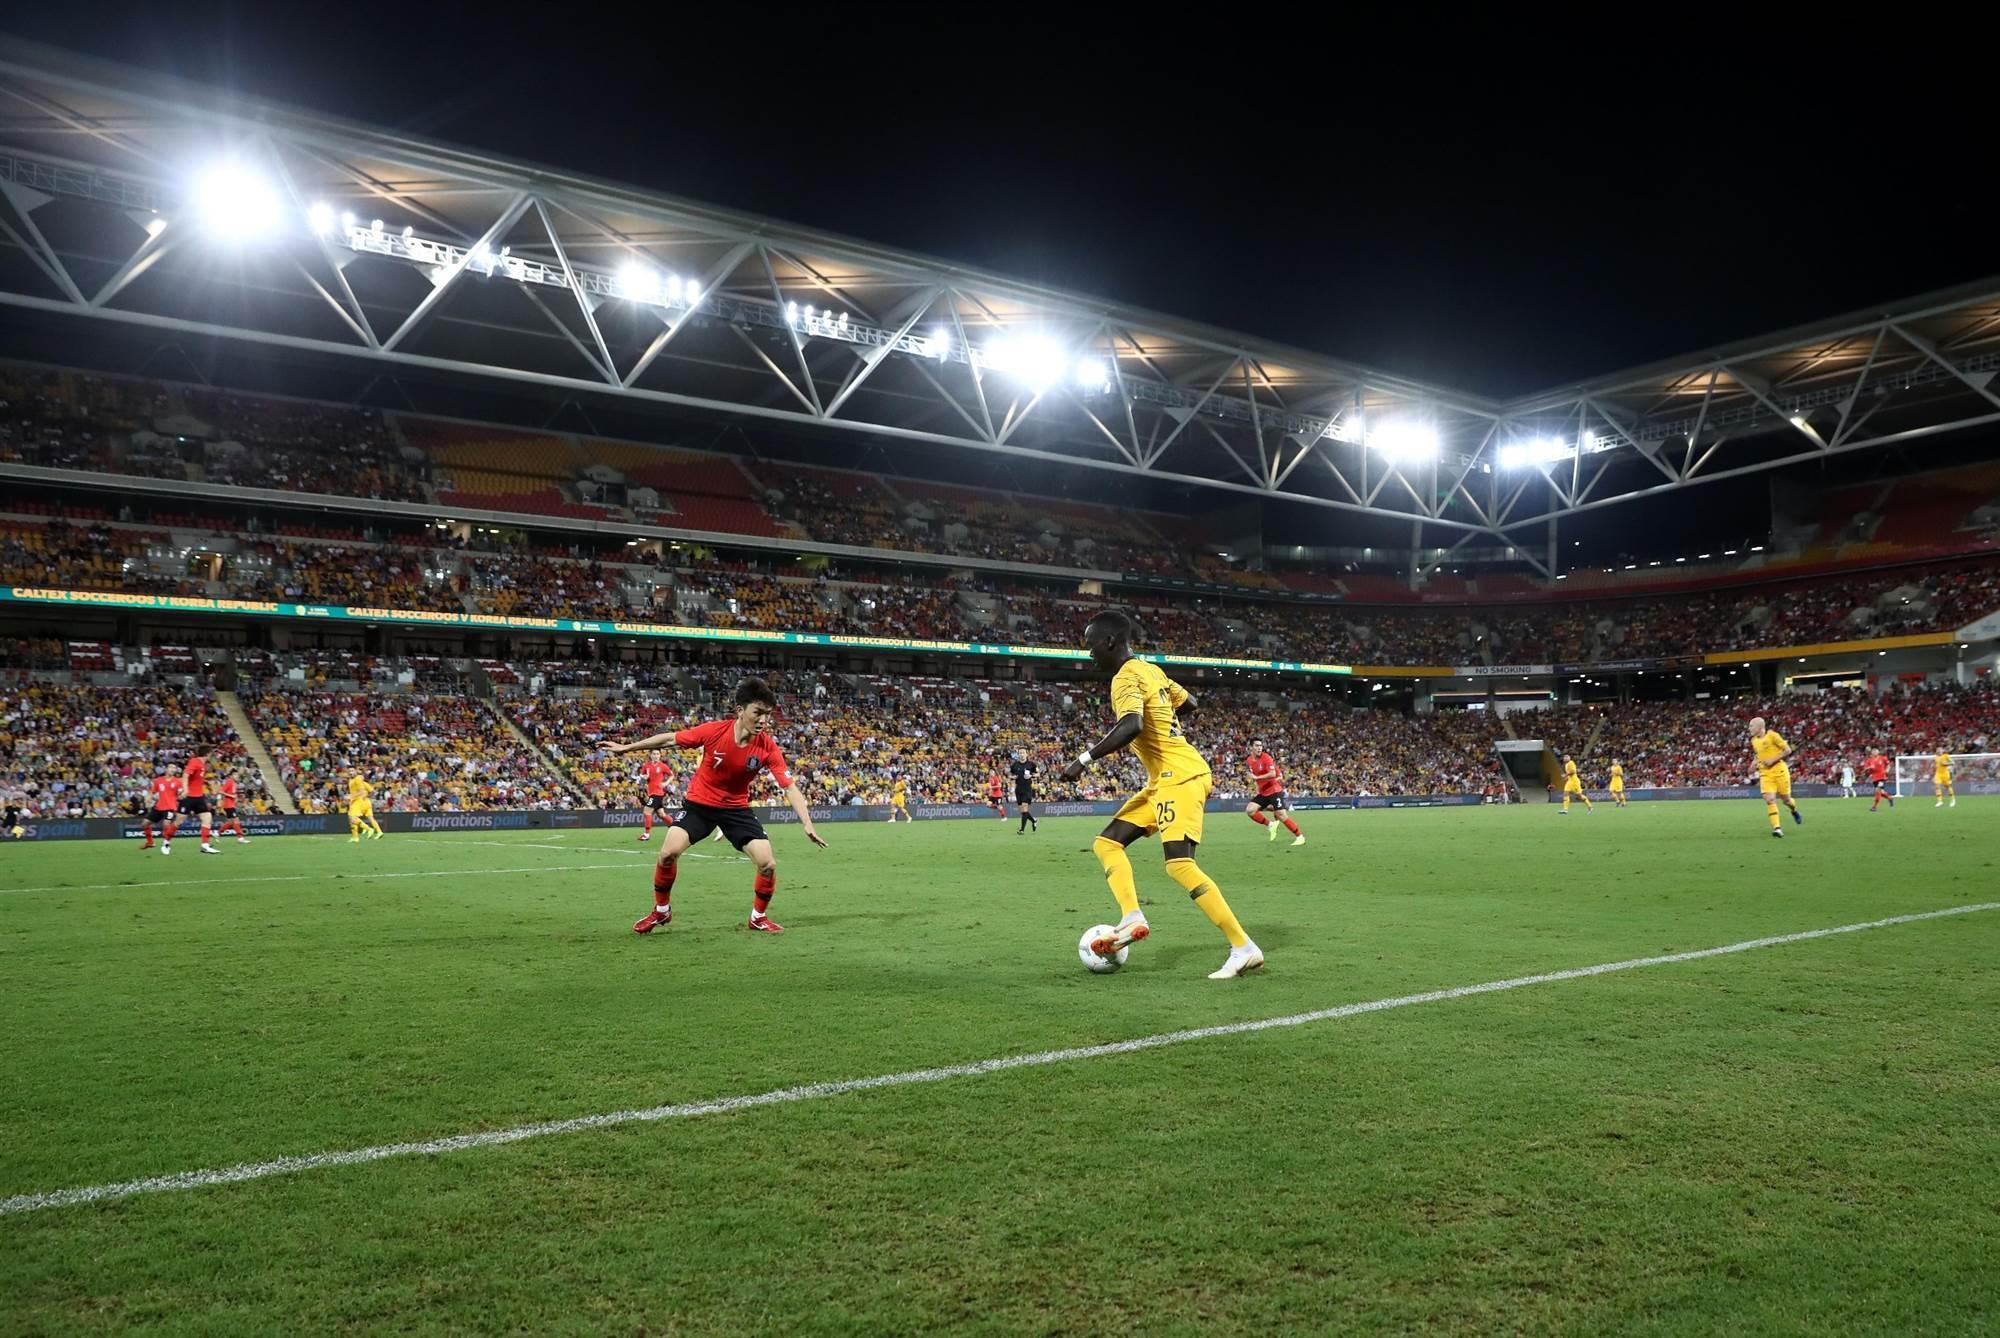 696f4ae58 Pic special  Socceroos vs Korea Republic - FTBL